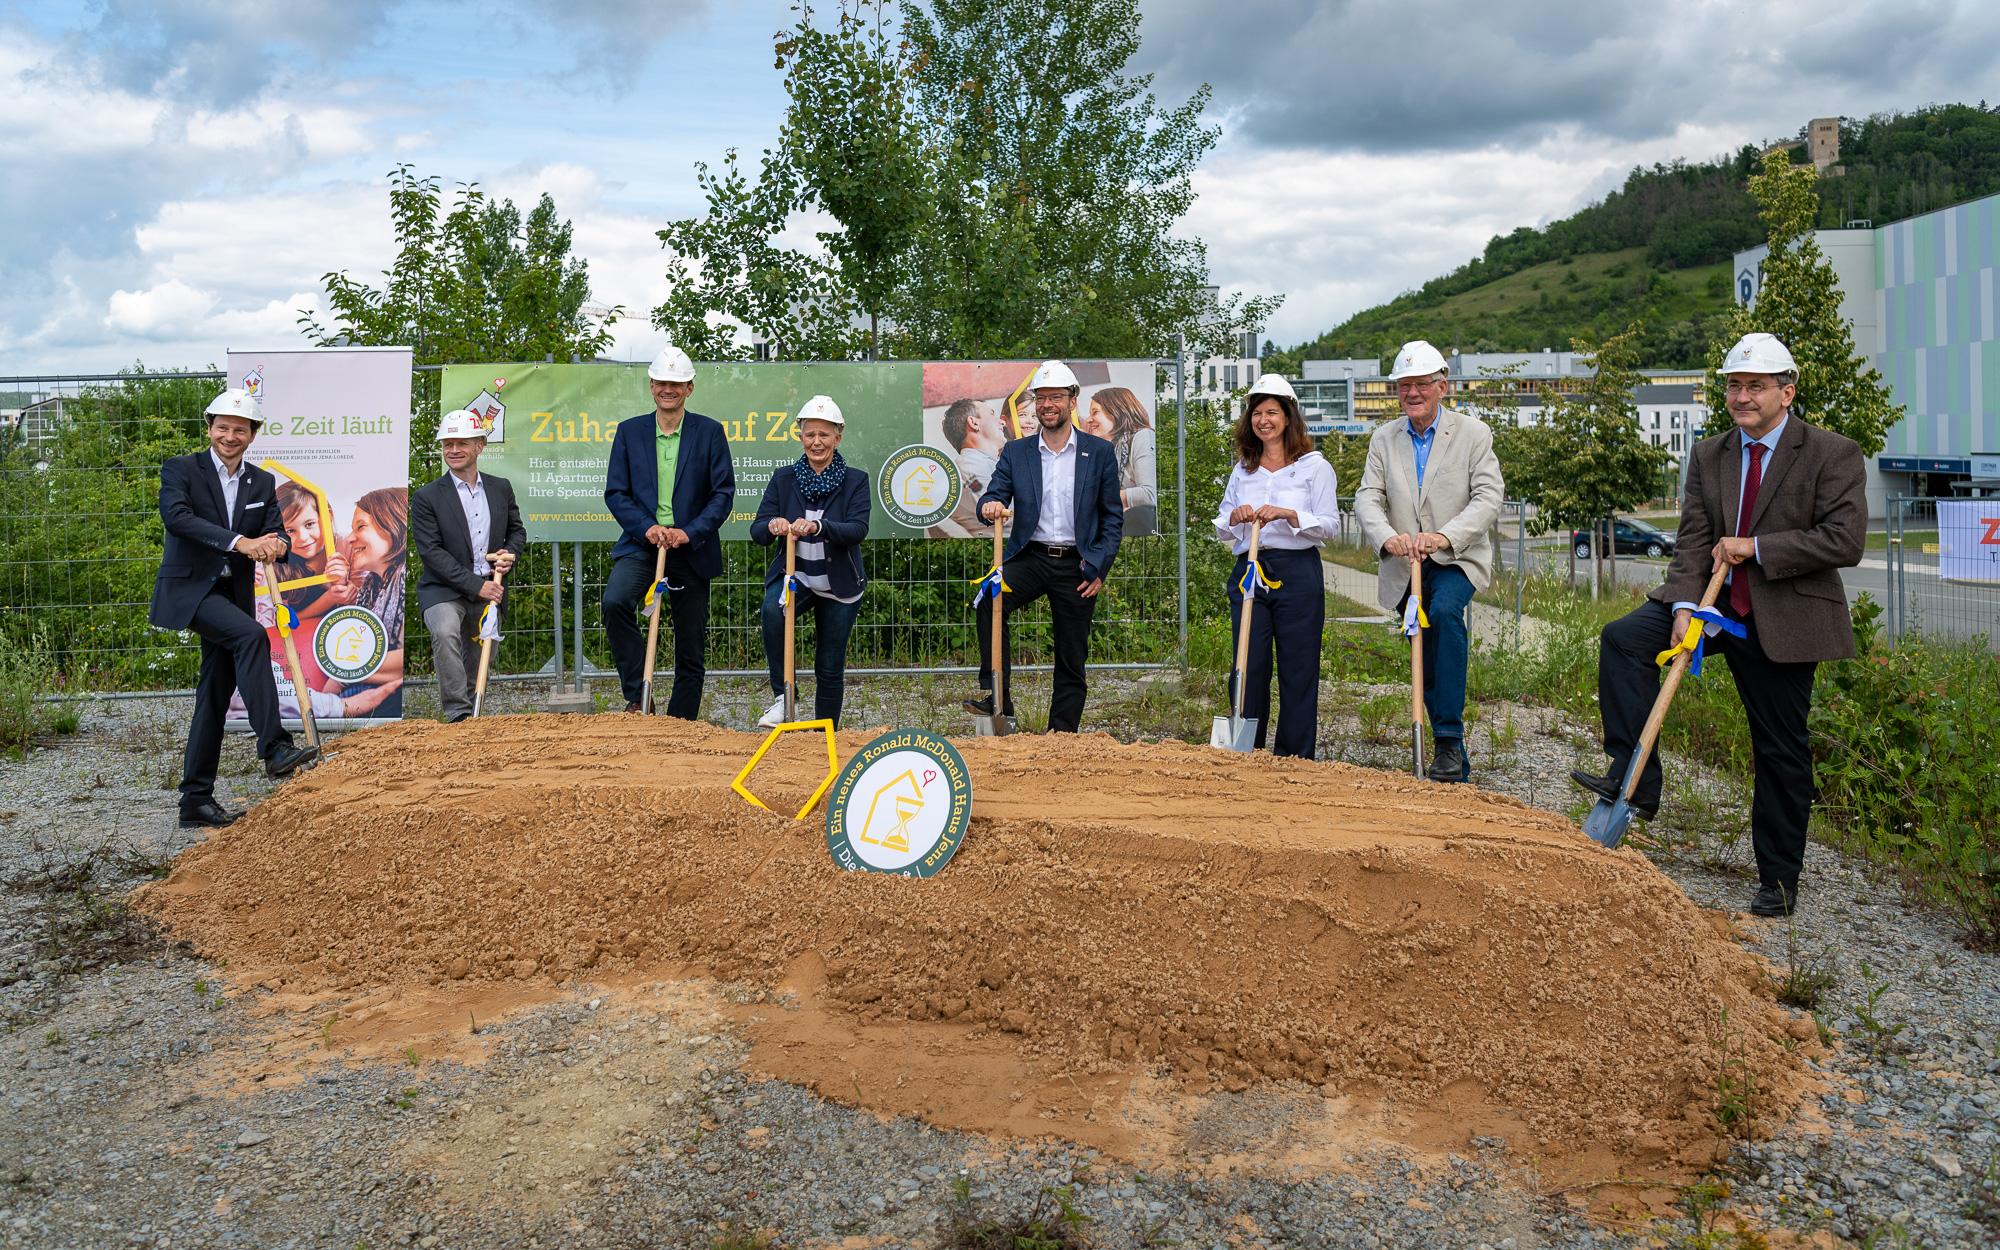 Bau des neuen Ronald McDonald Hauses startet